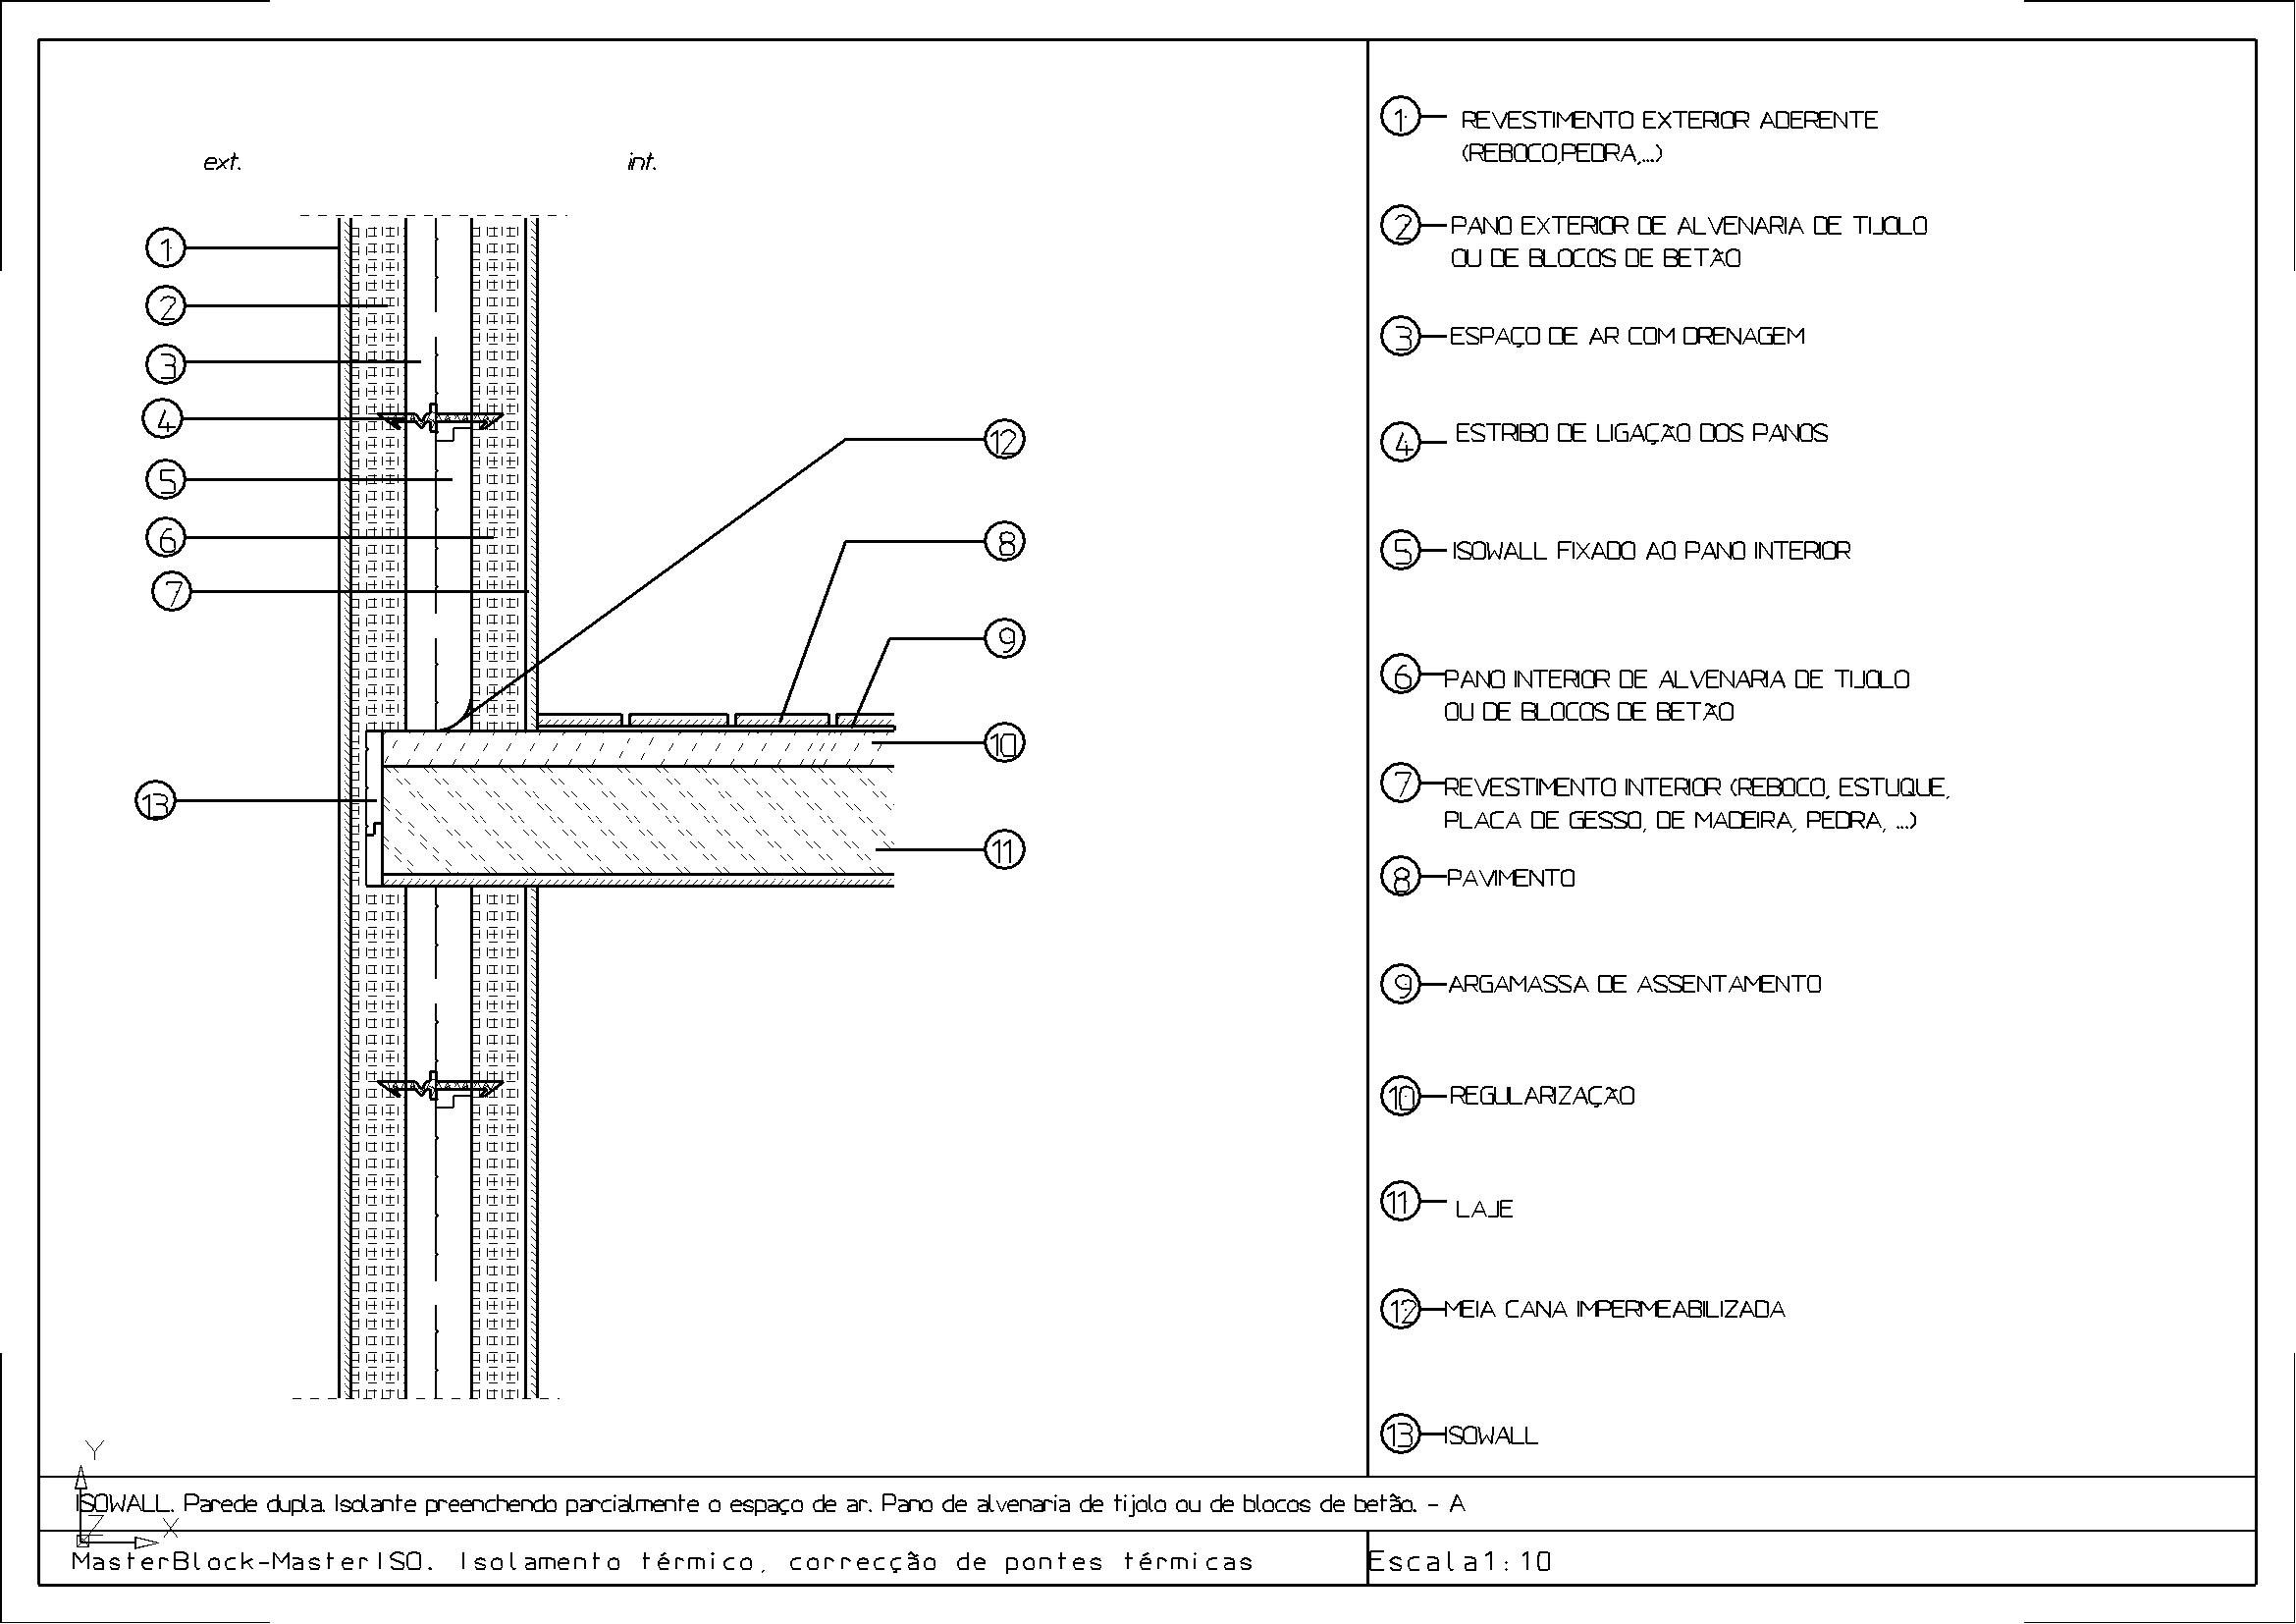 Imagens de #454545 Detalhes CAD de MASTER ISO MASTERBLOCK 2339x1654 px 3432 Bloco Cad Banheiro Corte